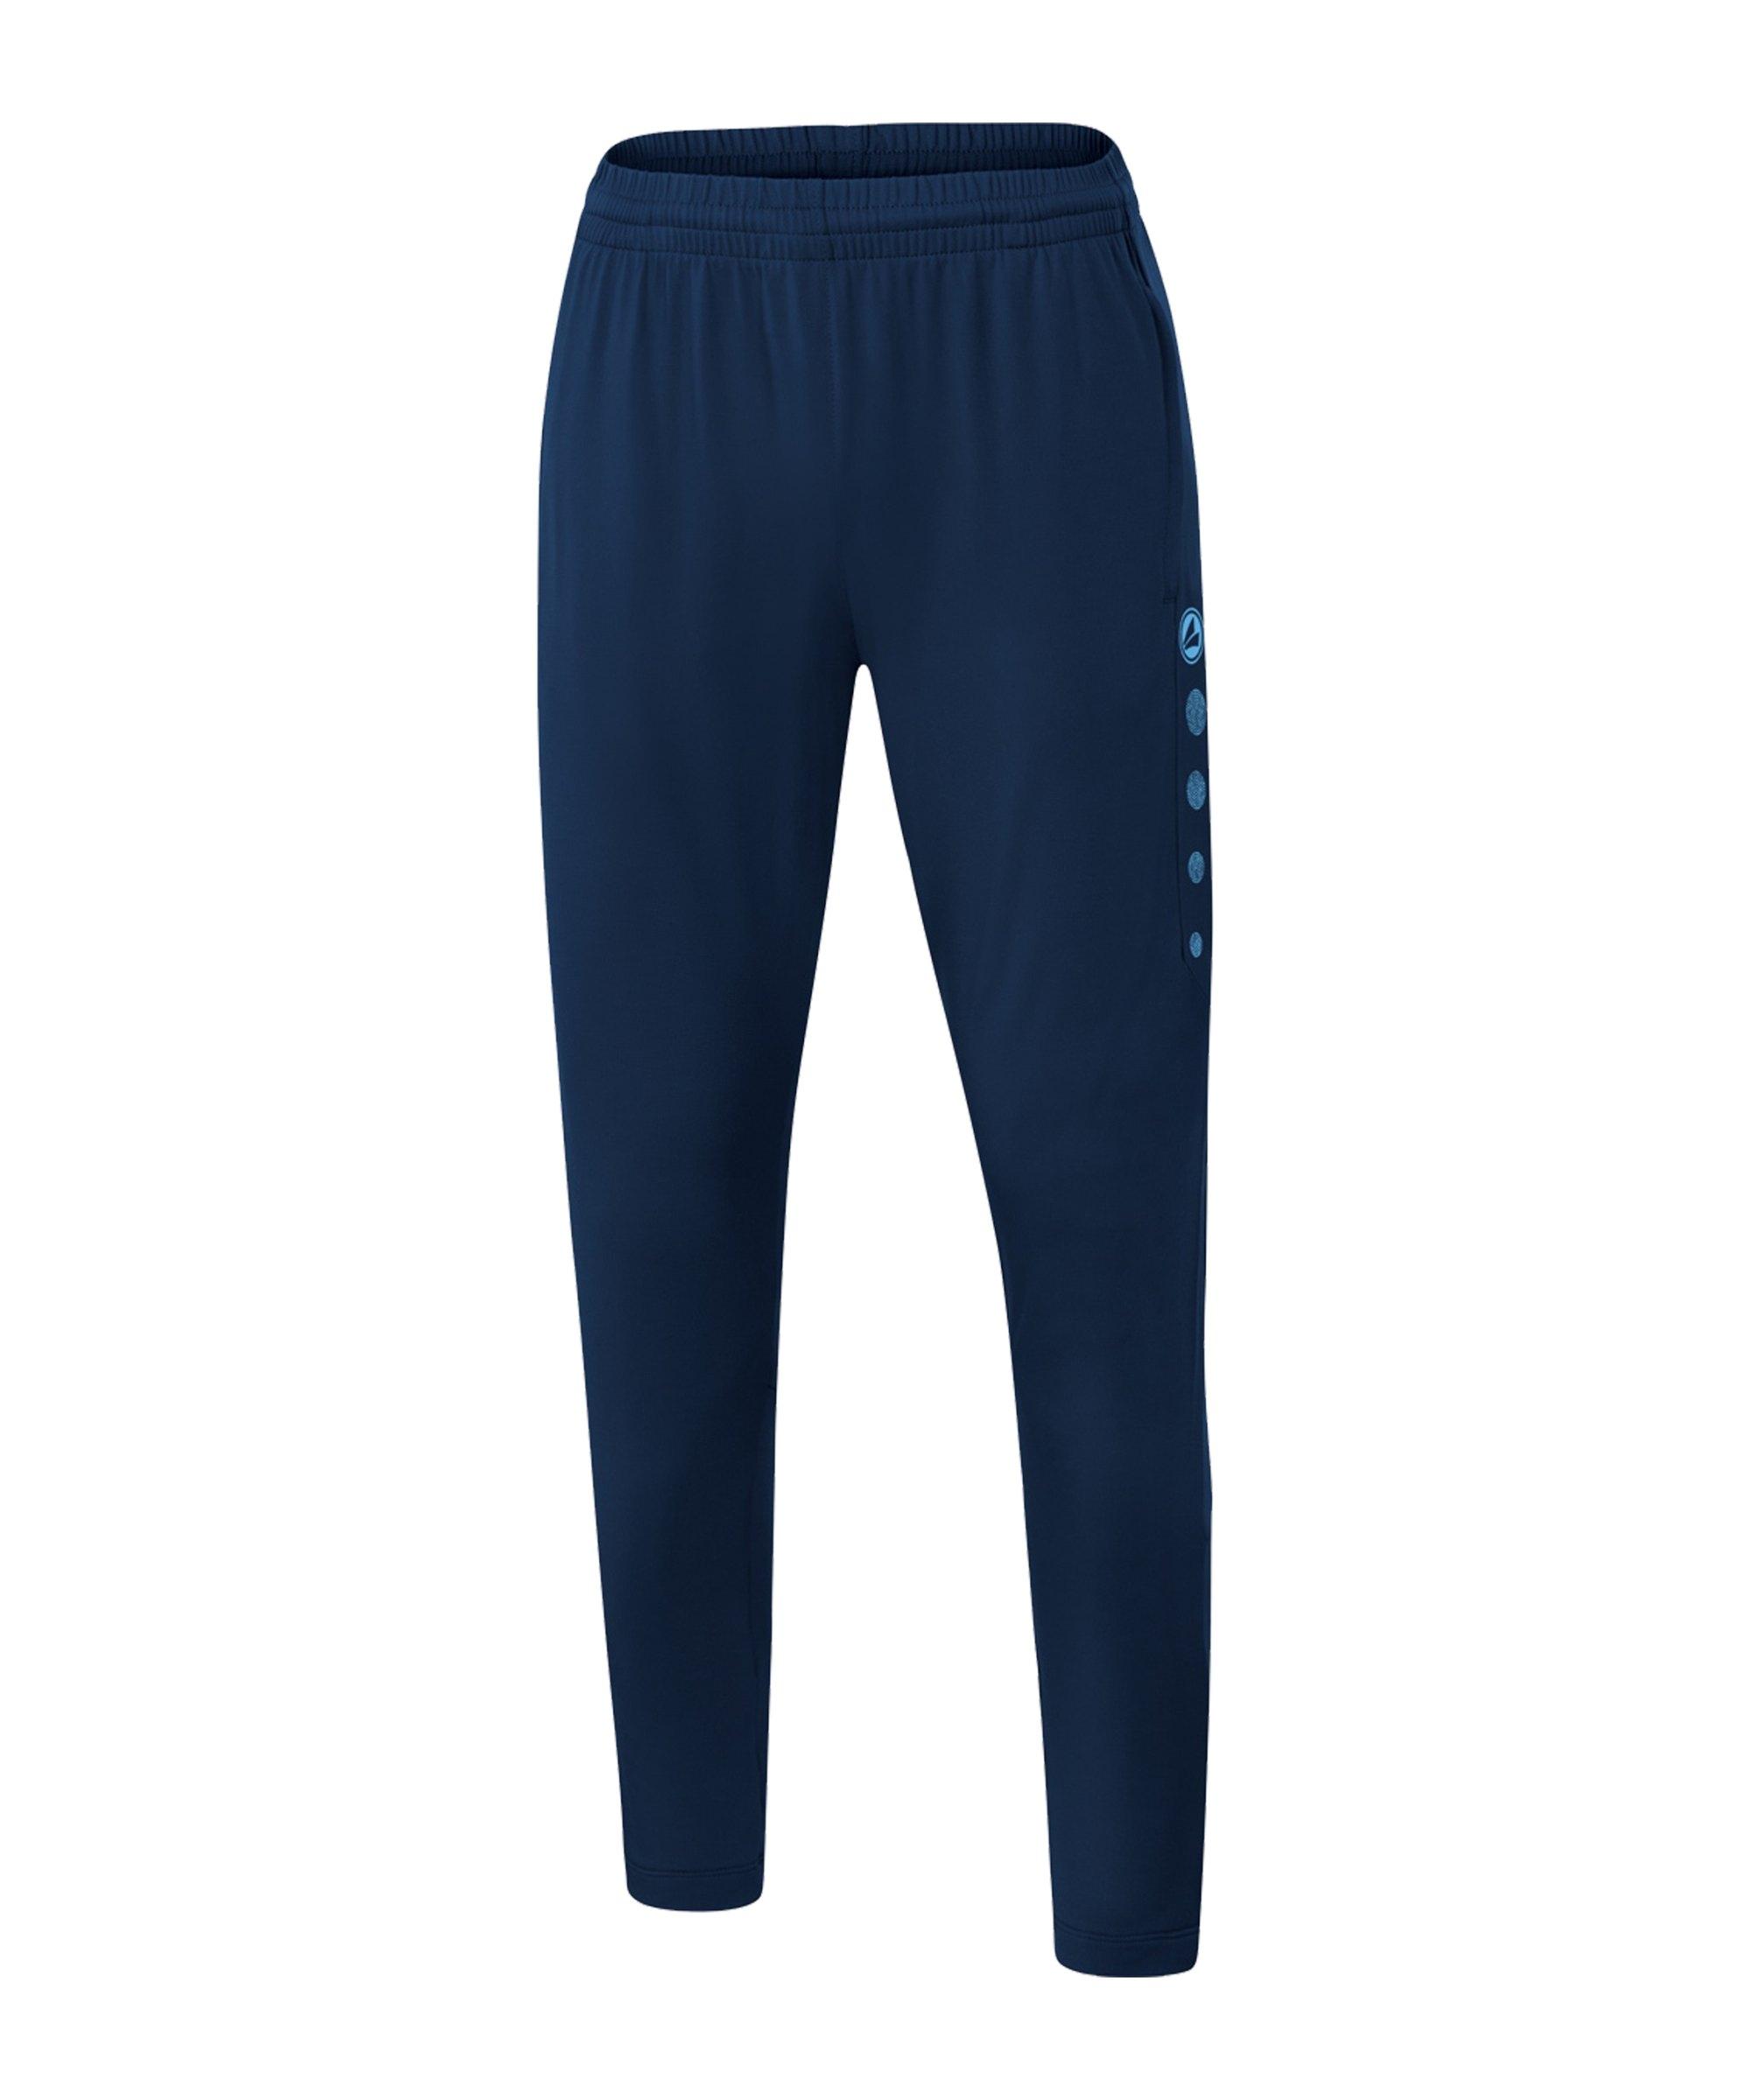 JAKO Premium Trainingshose Damen Blau F95 - blau